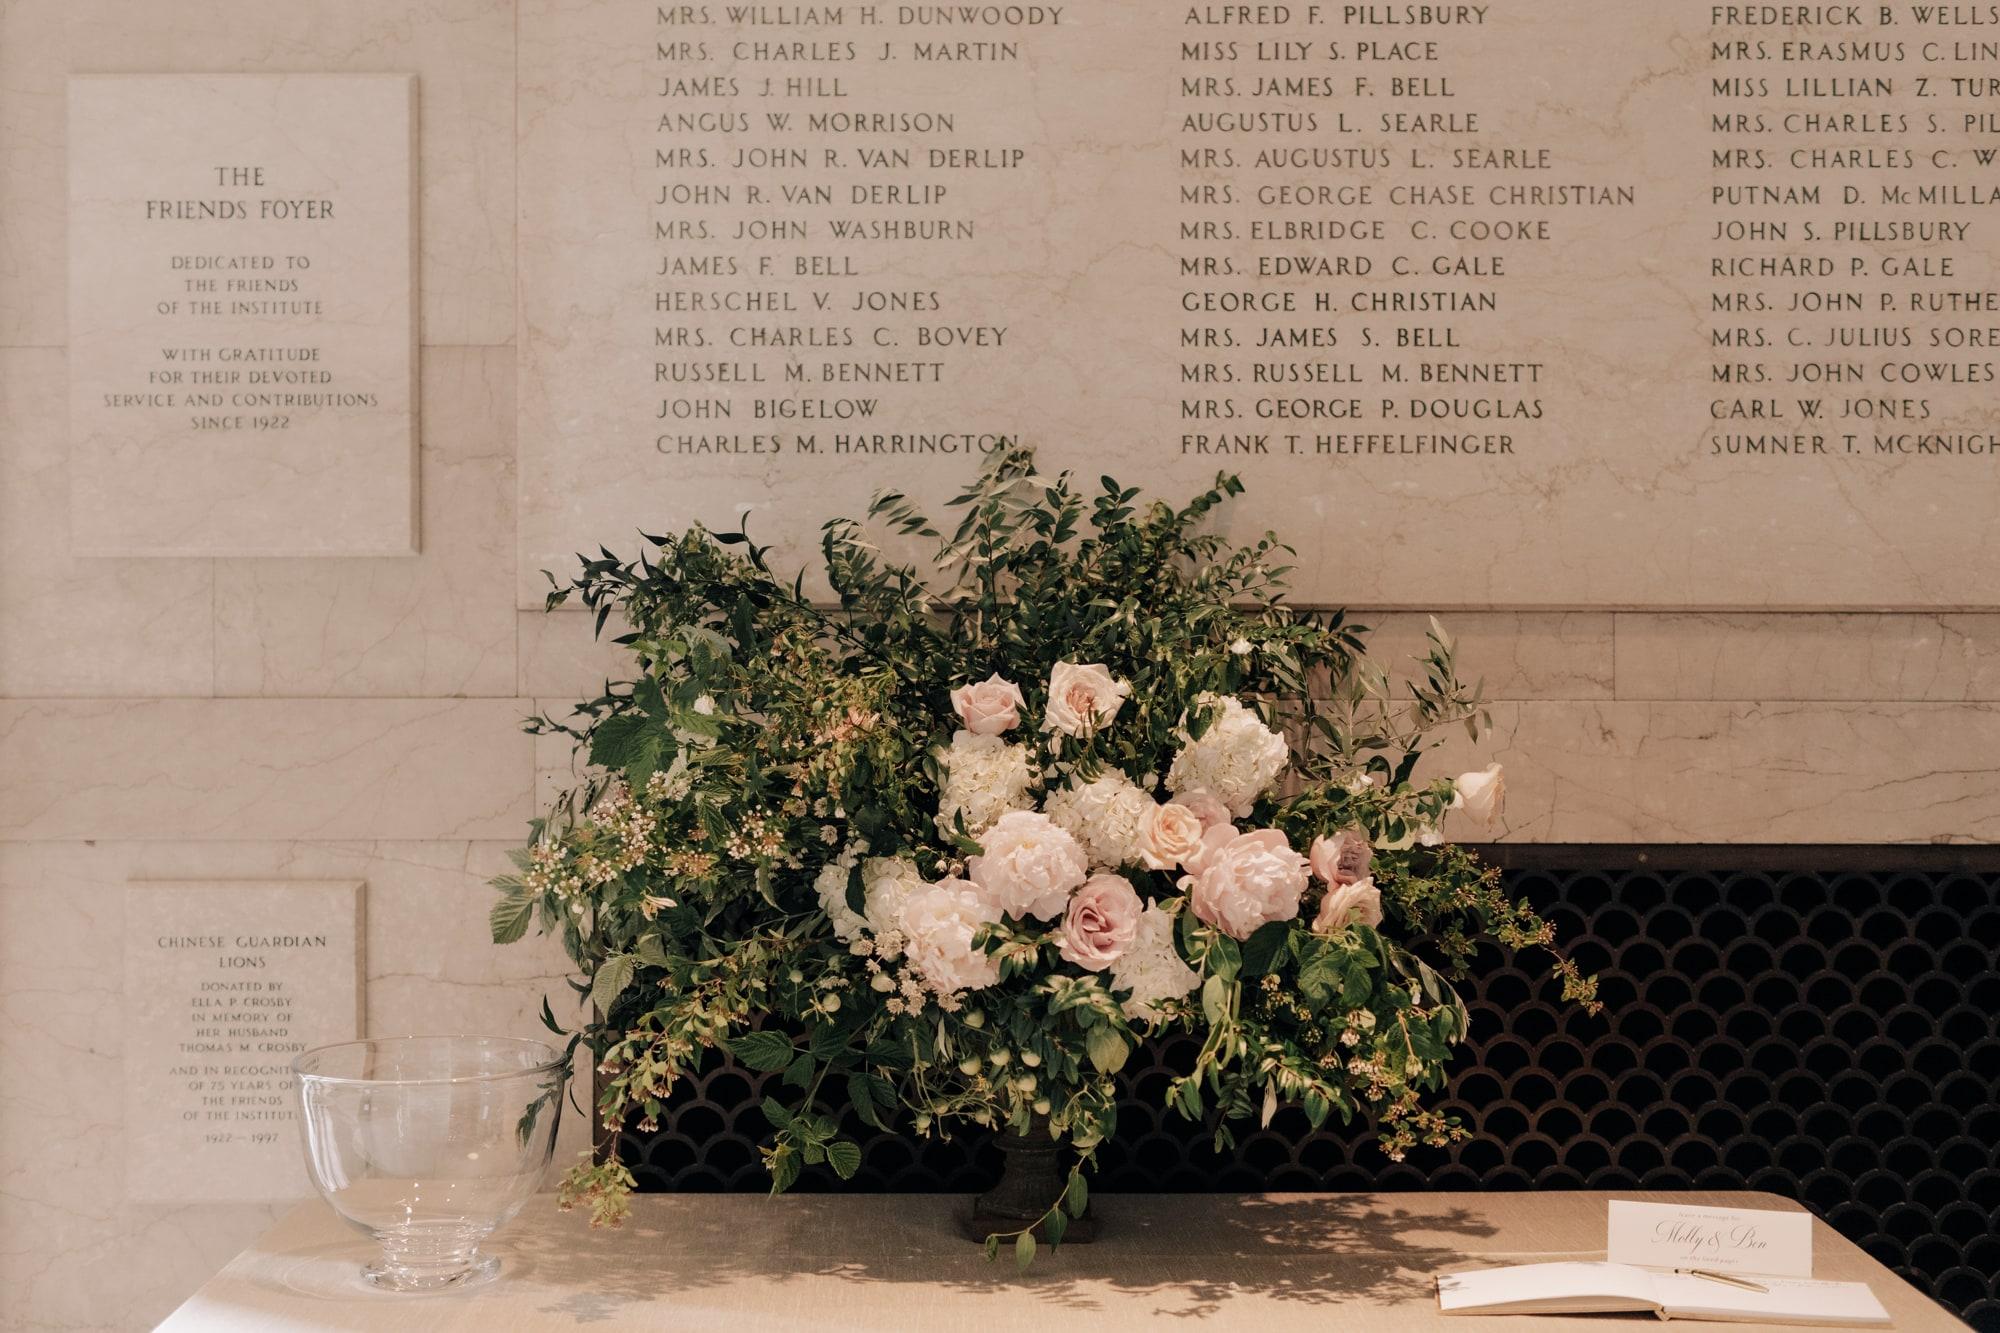 MIA-Minneapolis-Institute-Art-Summer-Wedding-_43.jpg